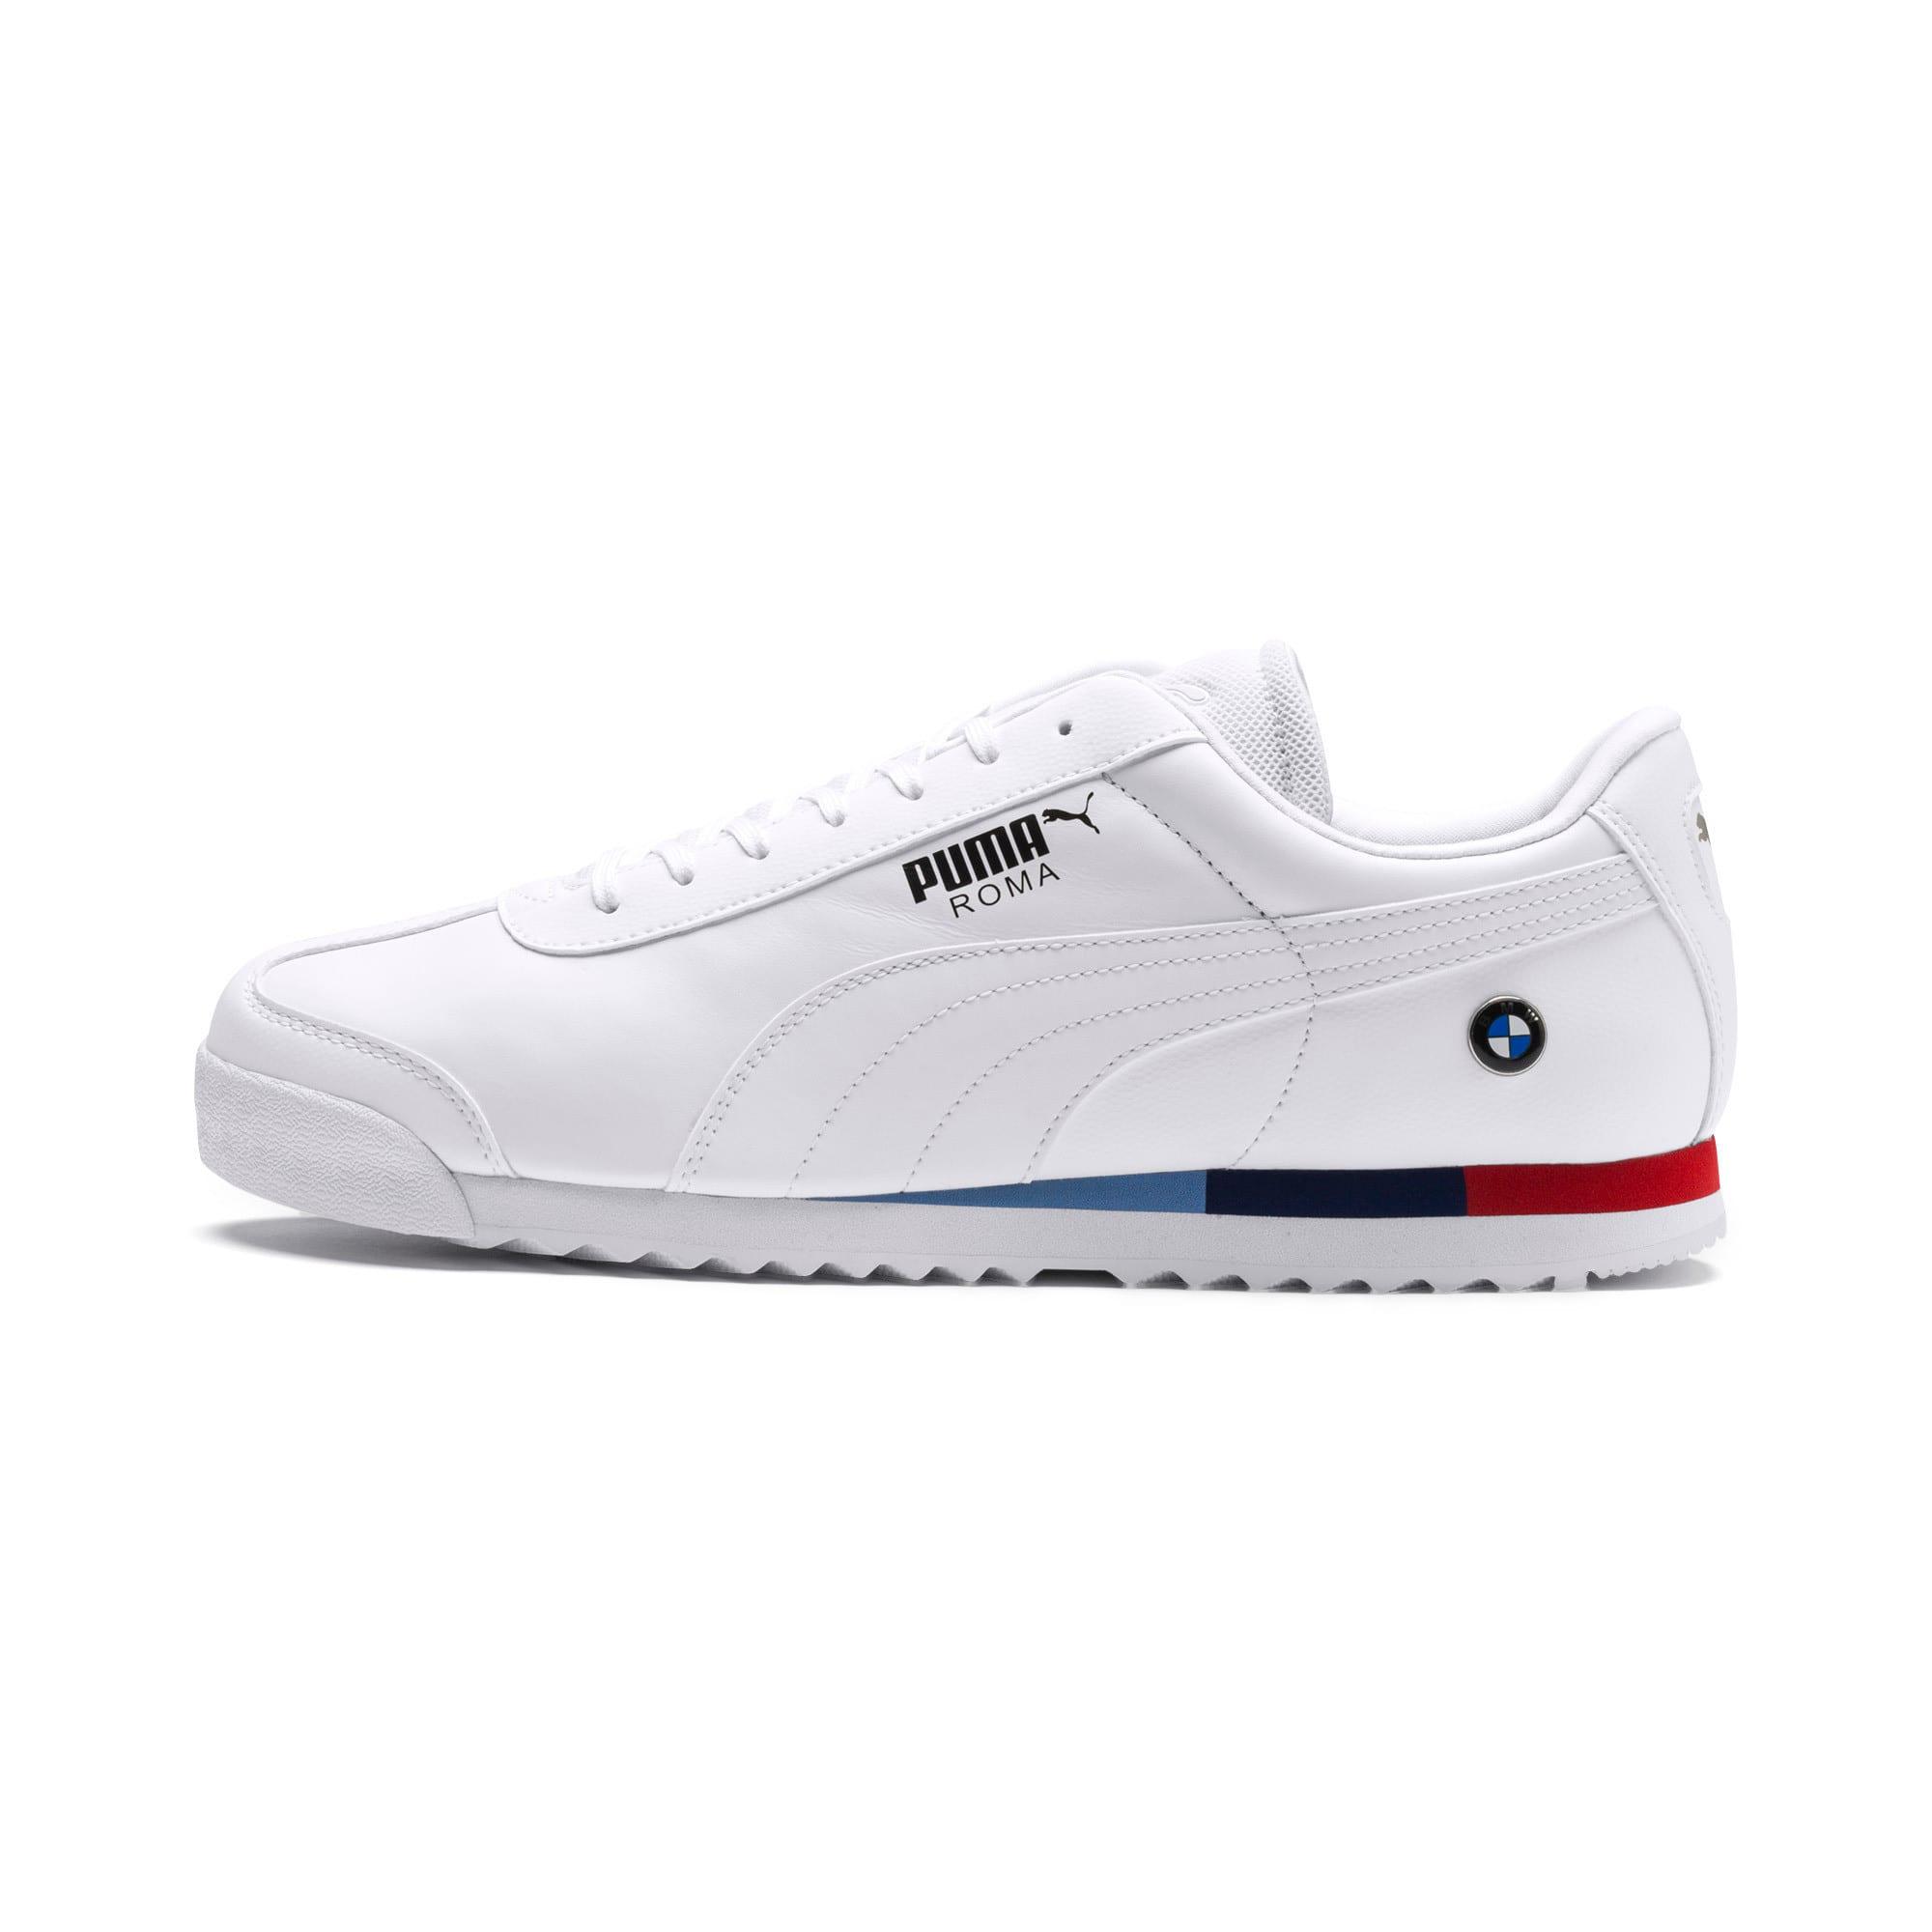 Thumbnail 1 of BMW M Motorsport Roma Herren Sneaker, Puma White-Puma White, medium